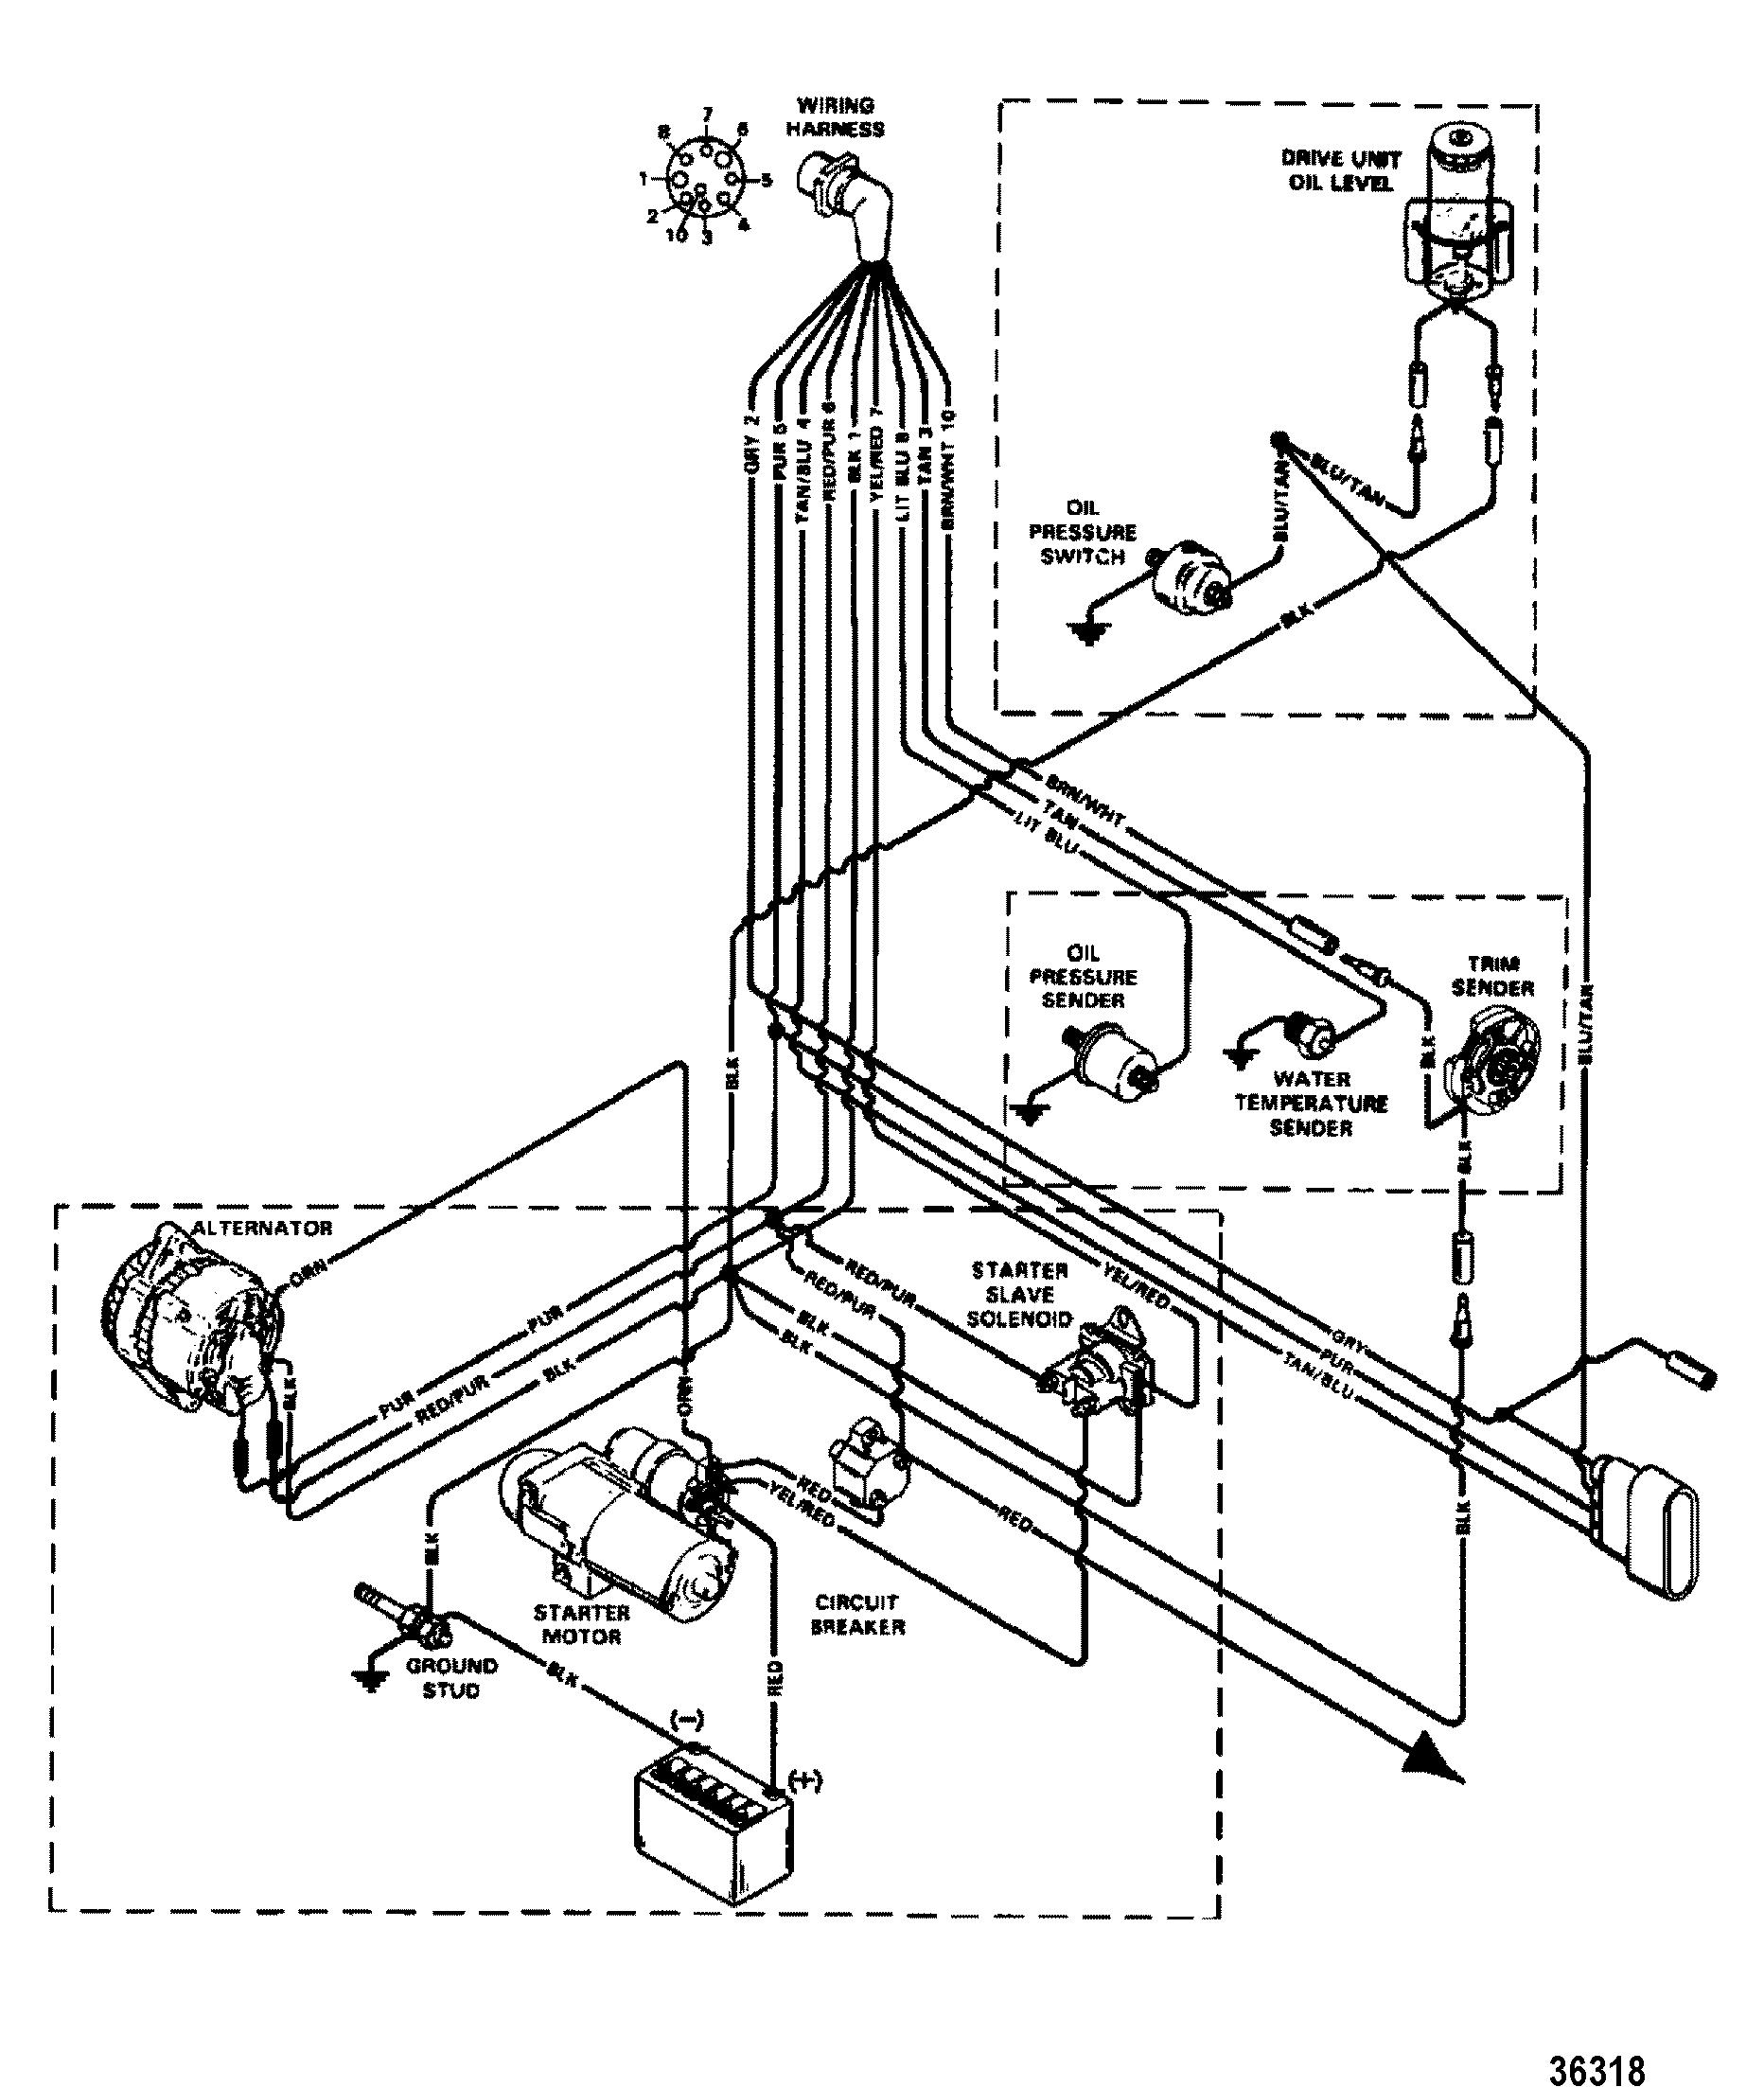 wiring diagram 1998 502 omc data wiring diagrams Mercruiser Electrical Diagrams wiring diagram 1998 502 omc wiring database library apc wiring diagram wiring diagram 1998 502 omc